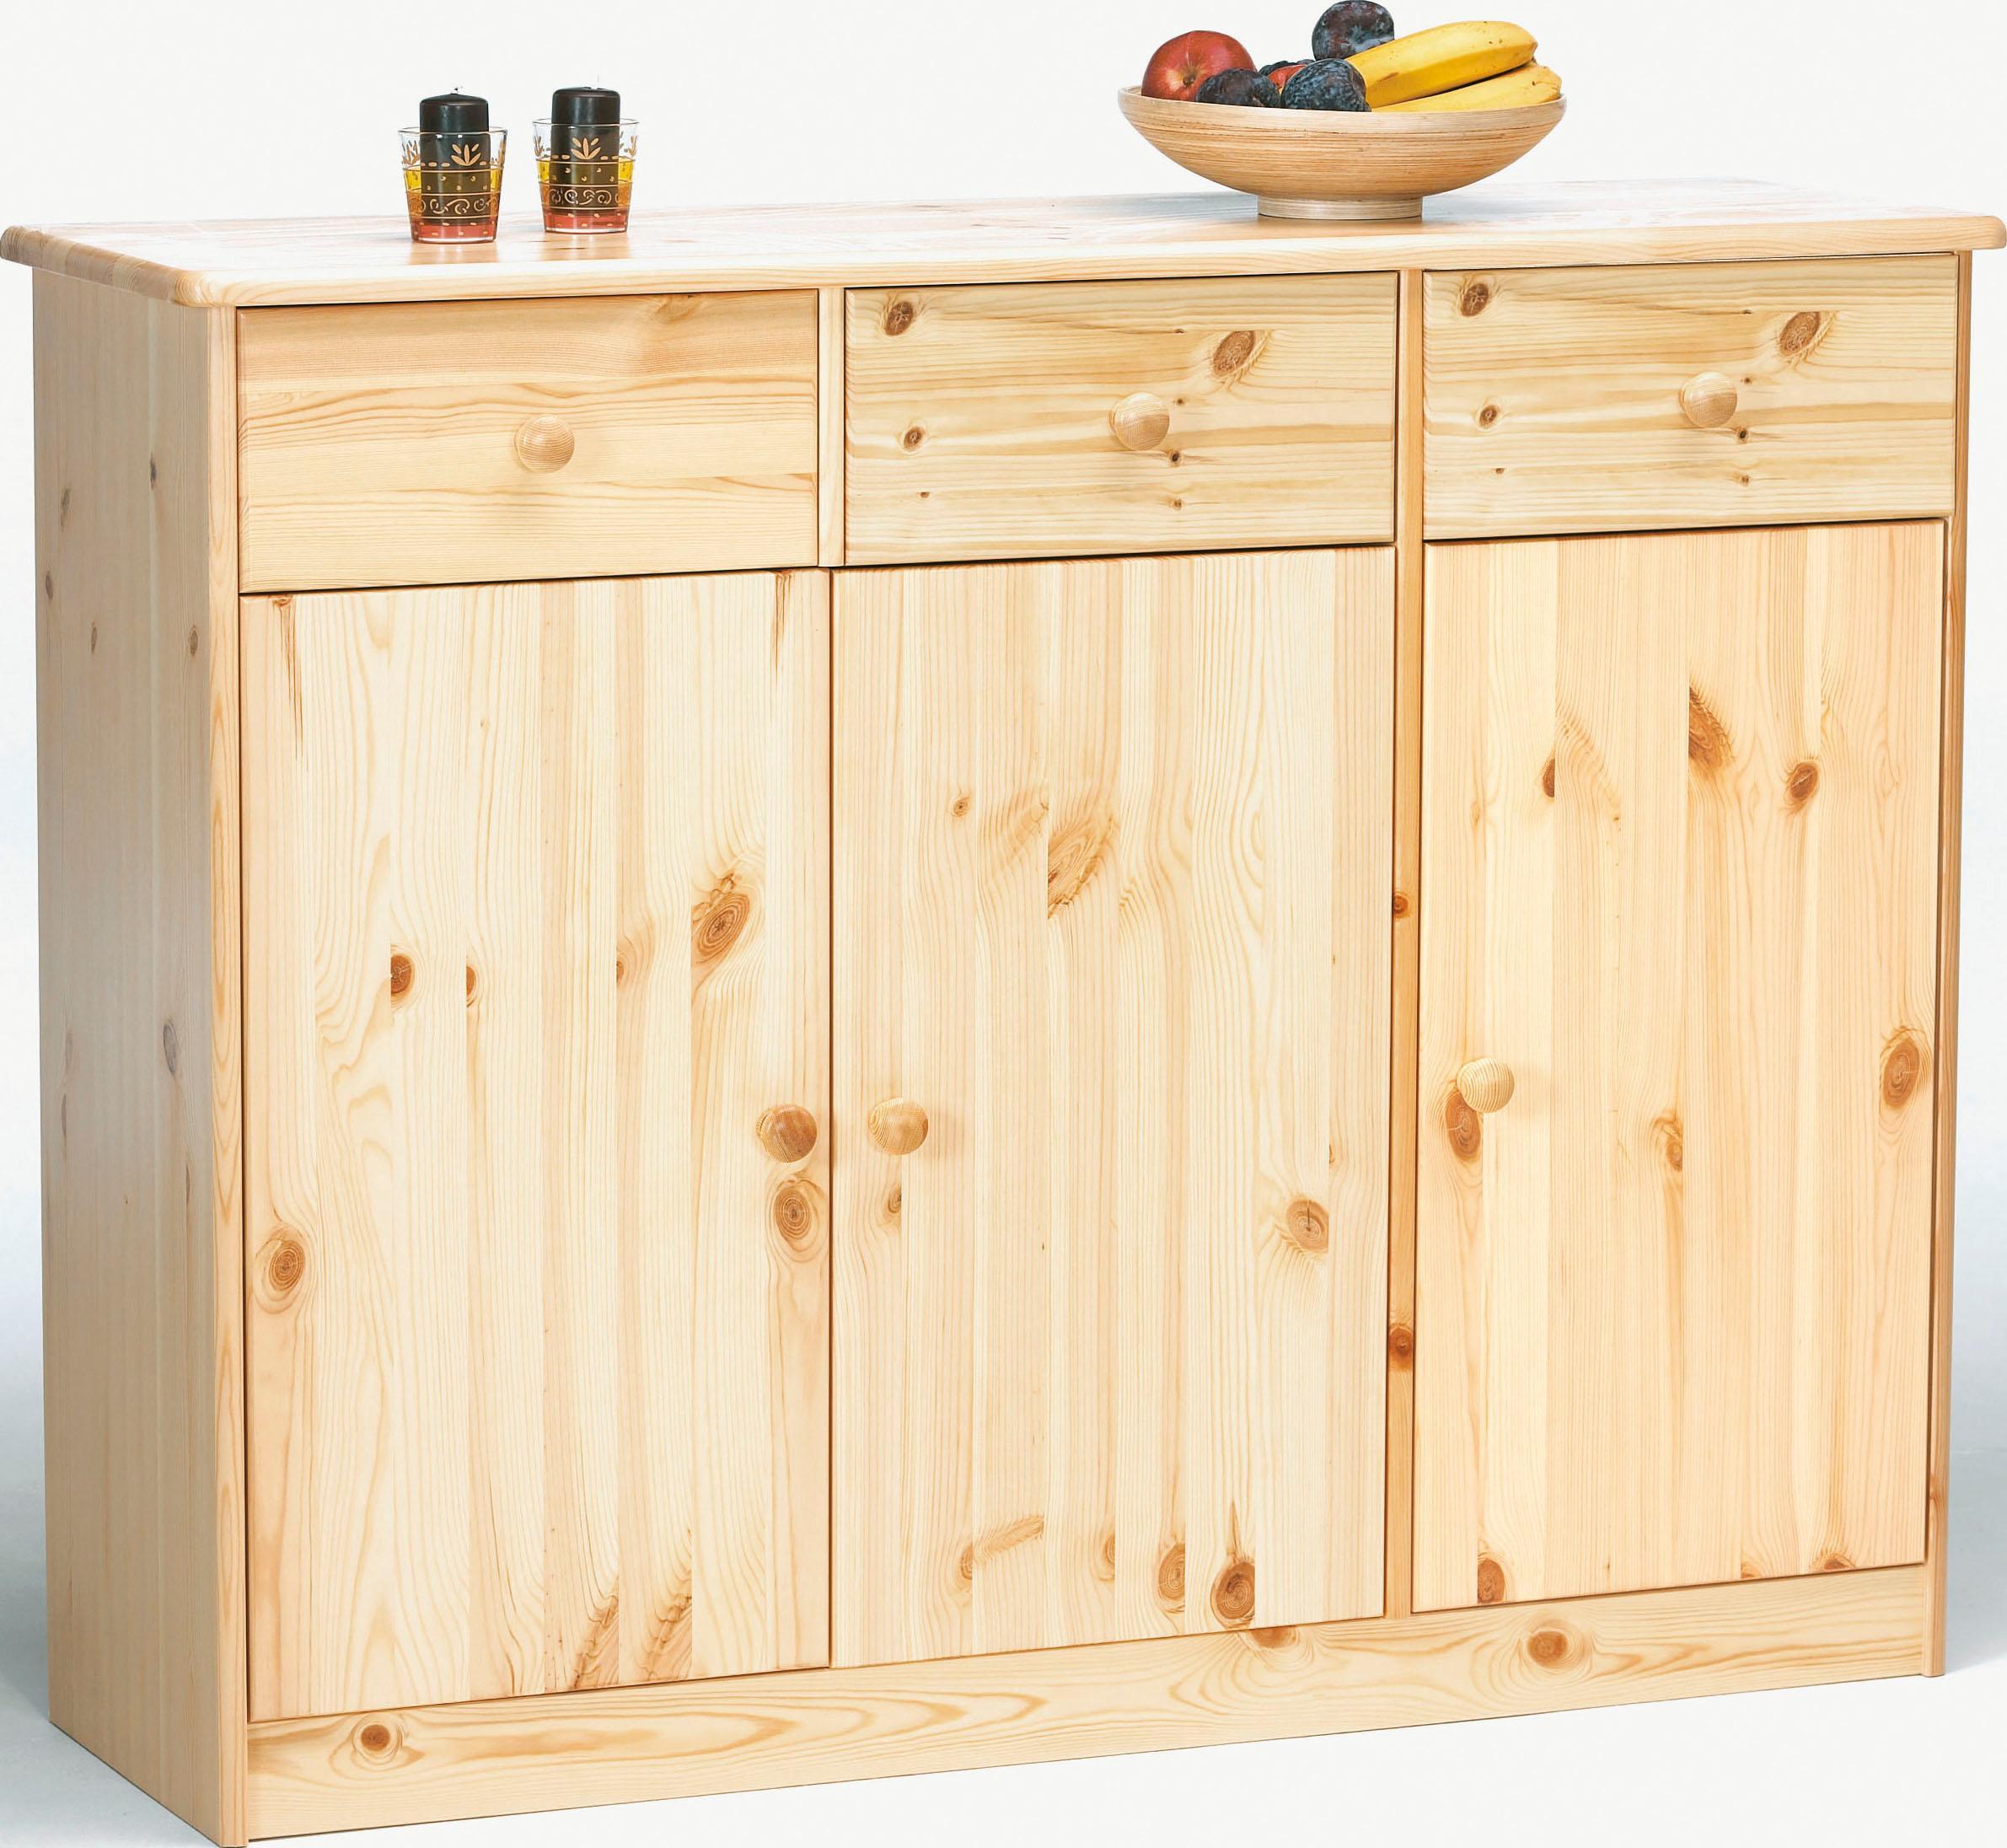 Home affaire Sideboard Mario Breite 115 cm